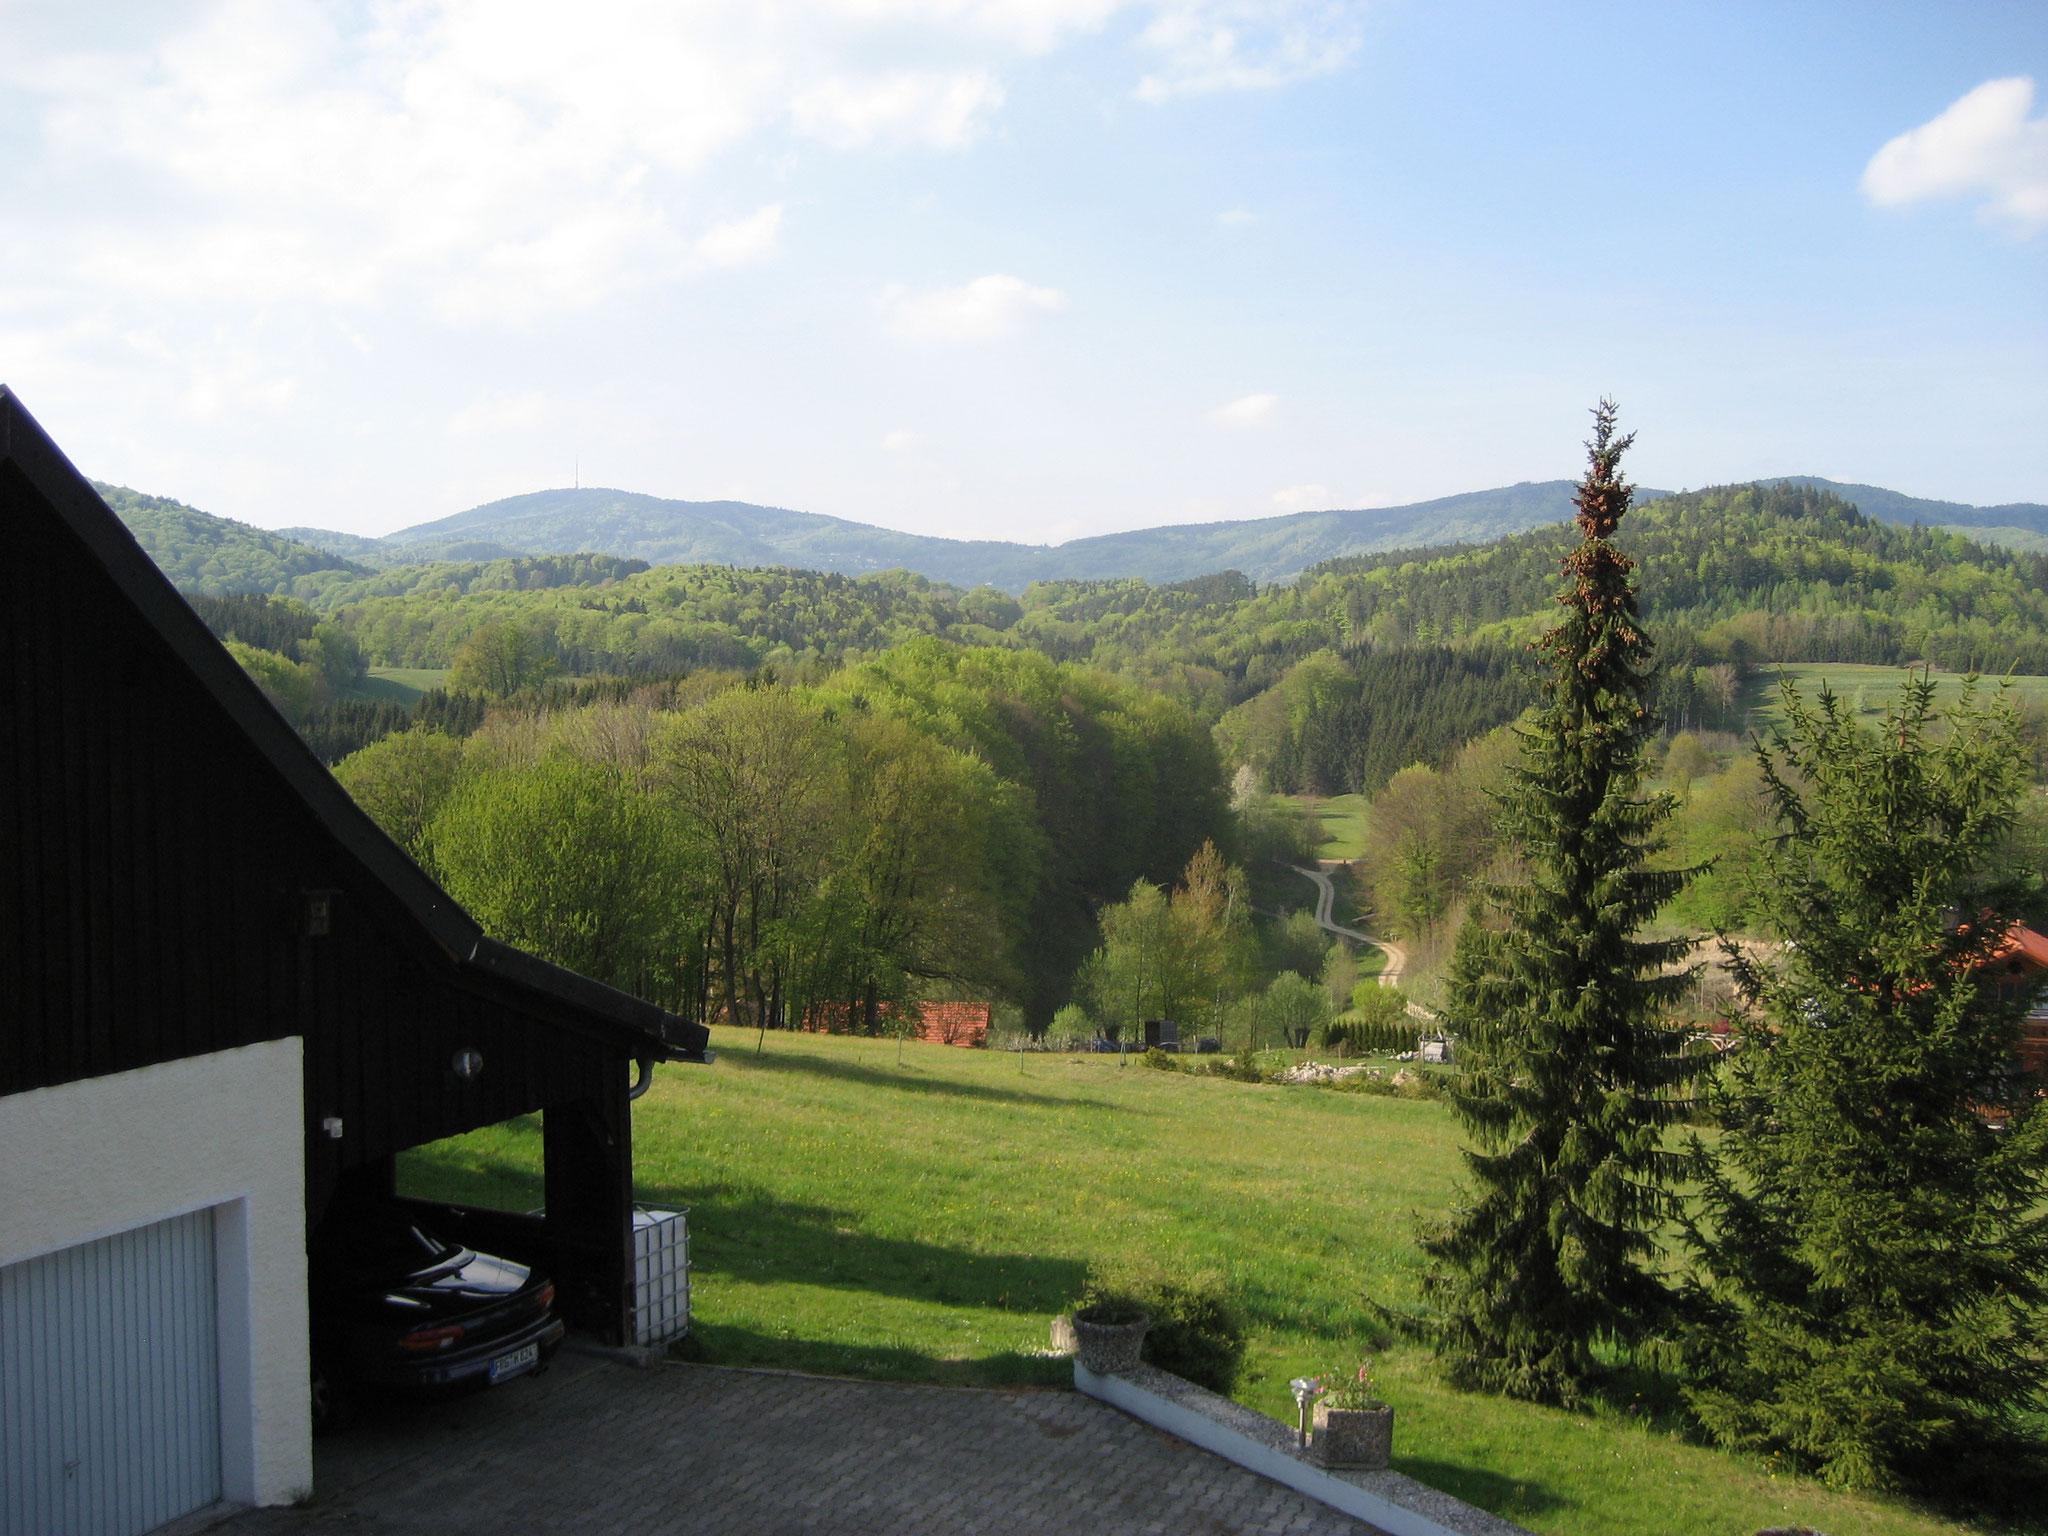 Panoramaausblick auf den Haus- und Skiberg Brotjacklriegl